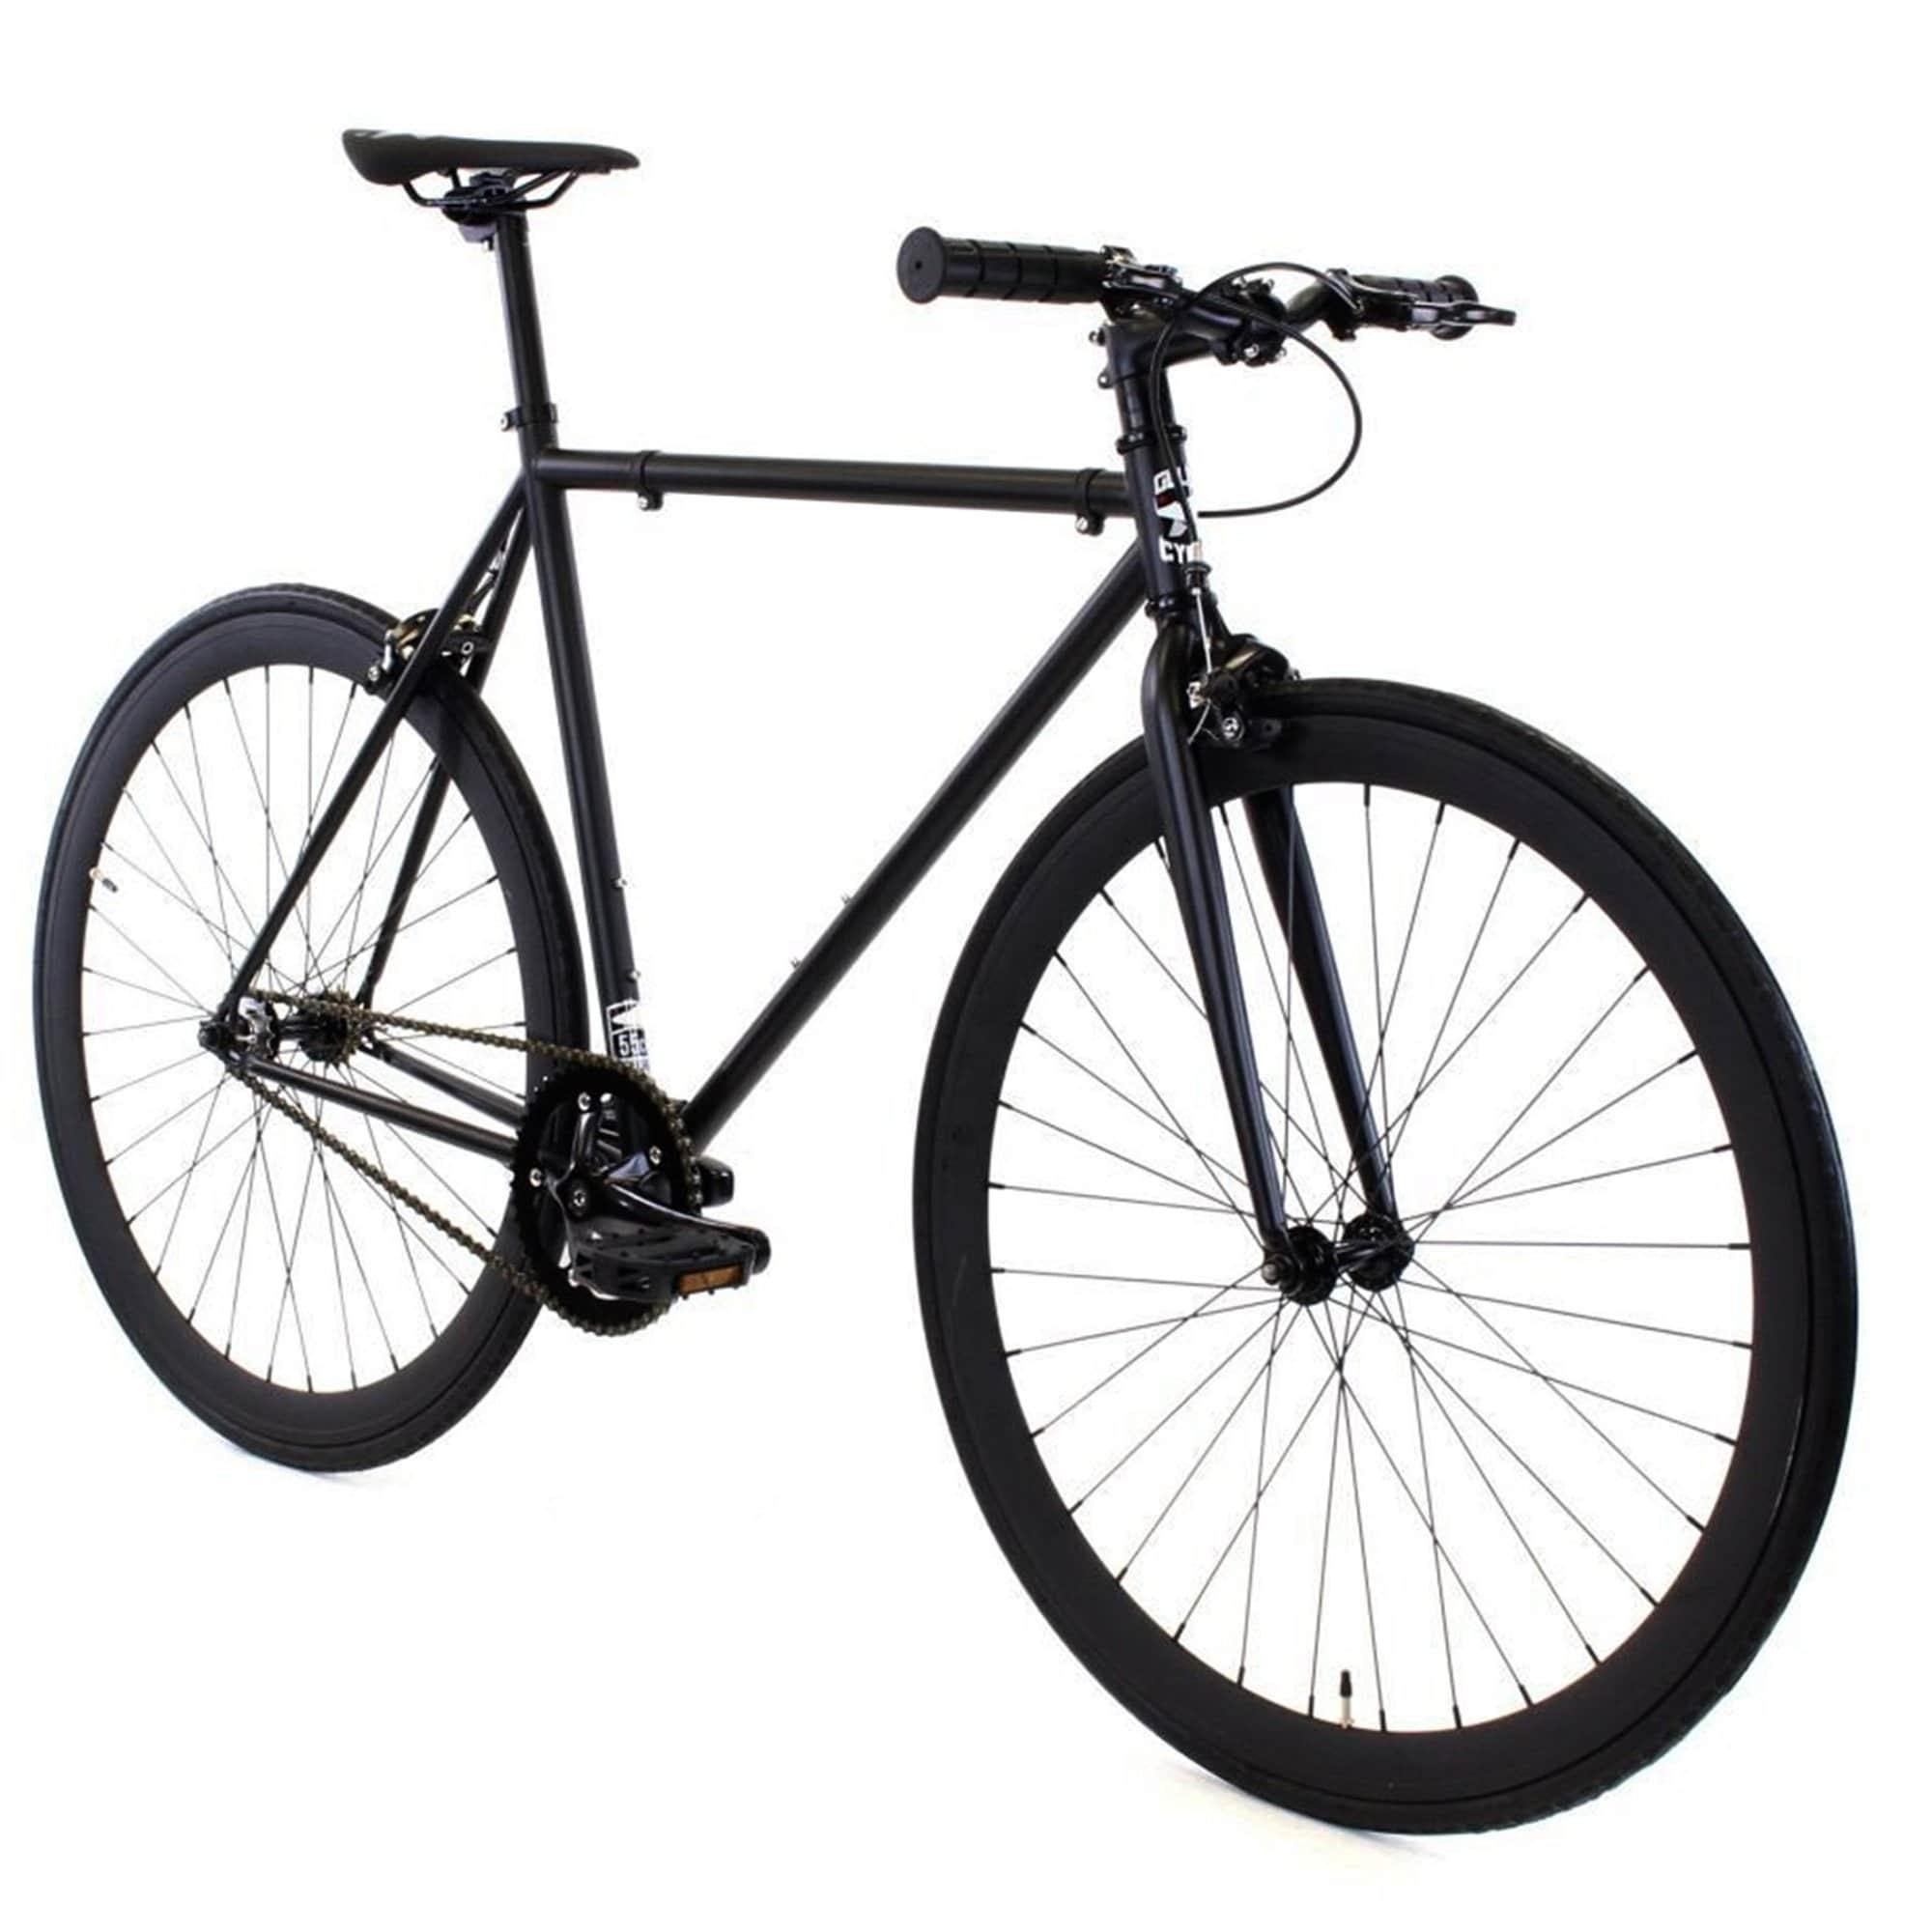 Shop Fixed Gear - GOLDEN CYCLES Fixed Gear Bike Steel Frame Fixie ...